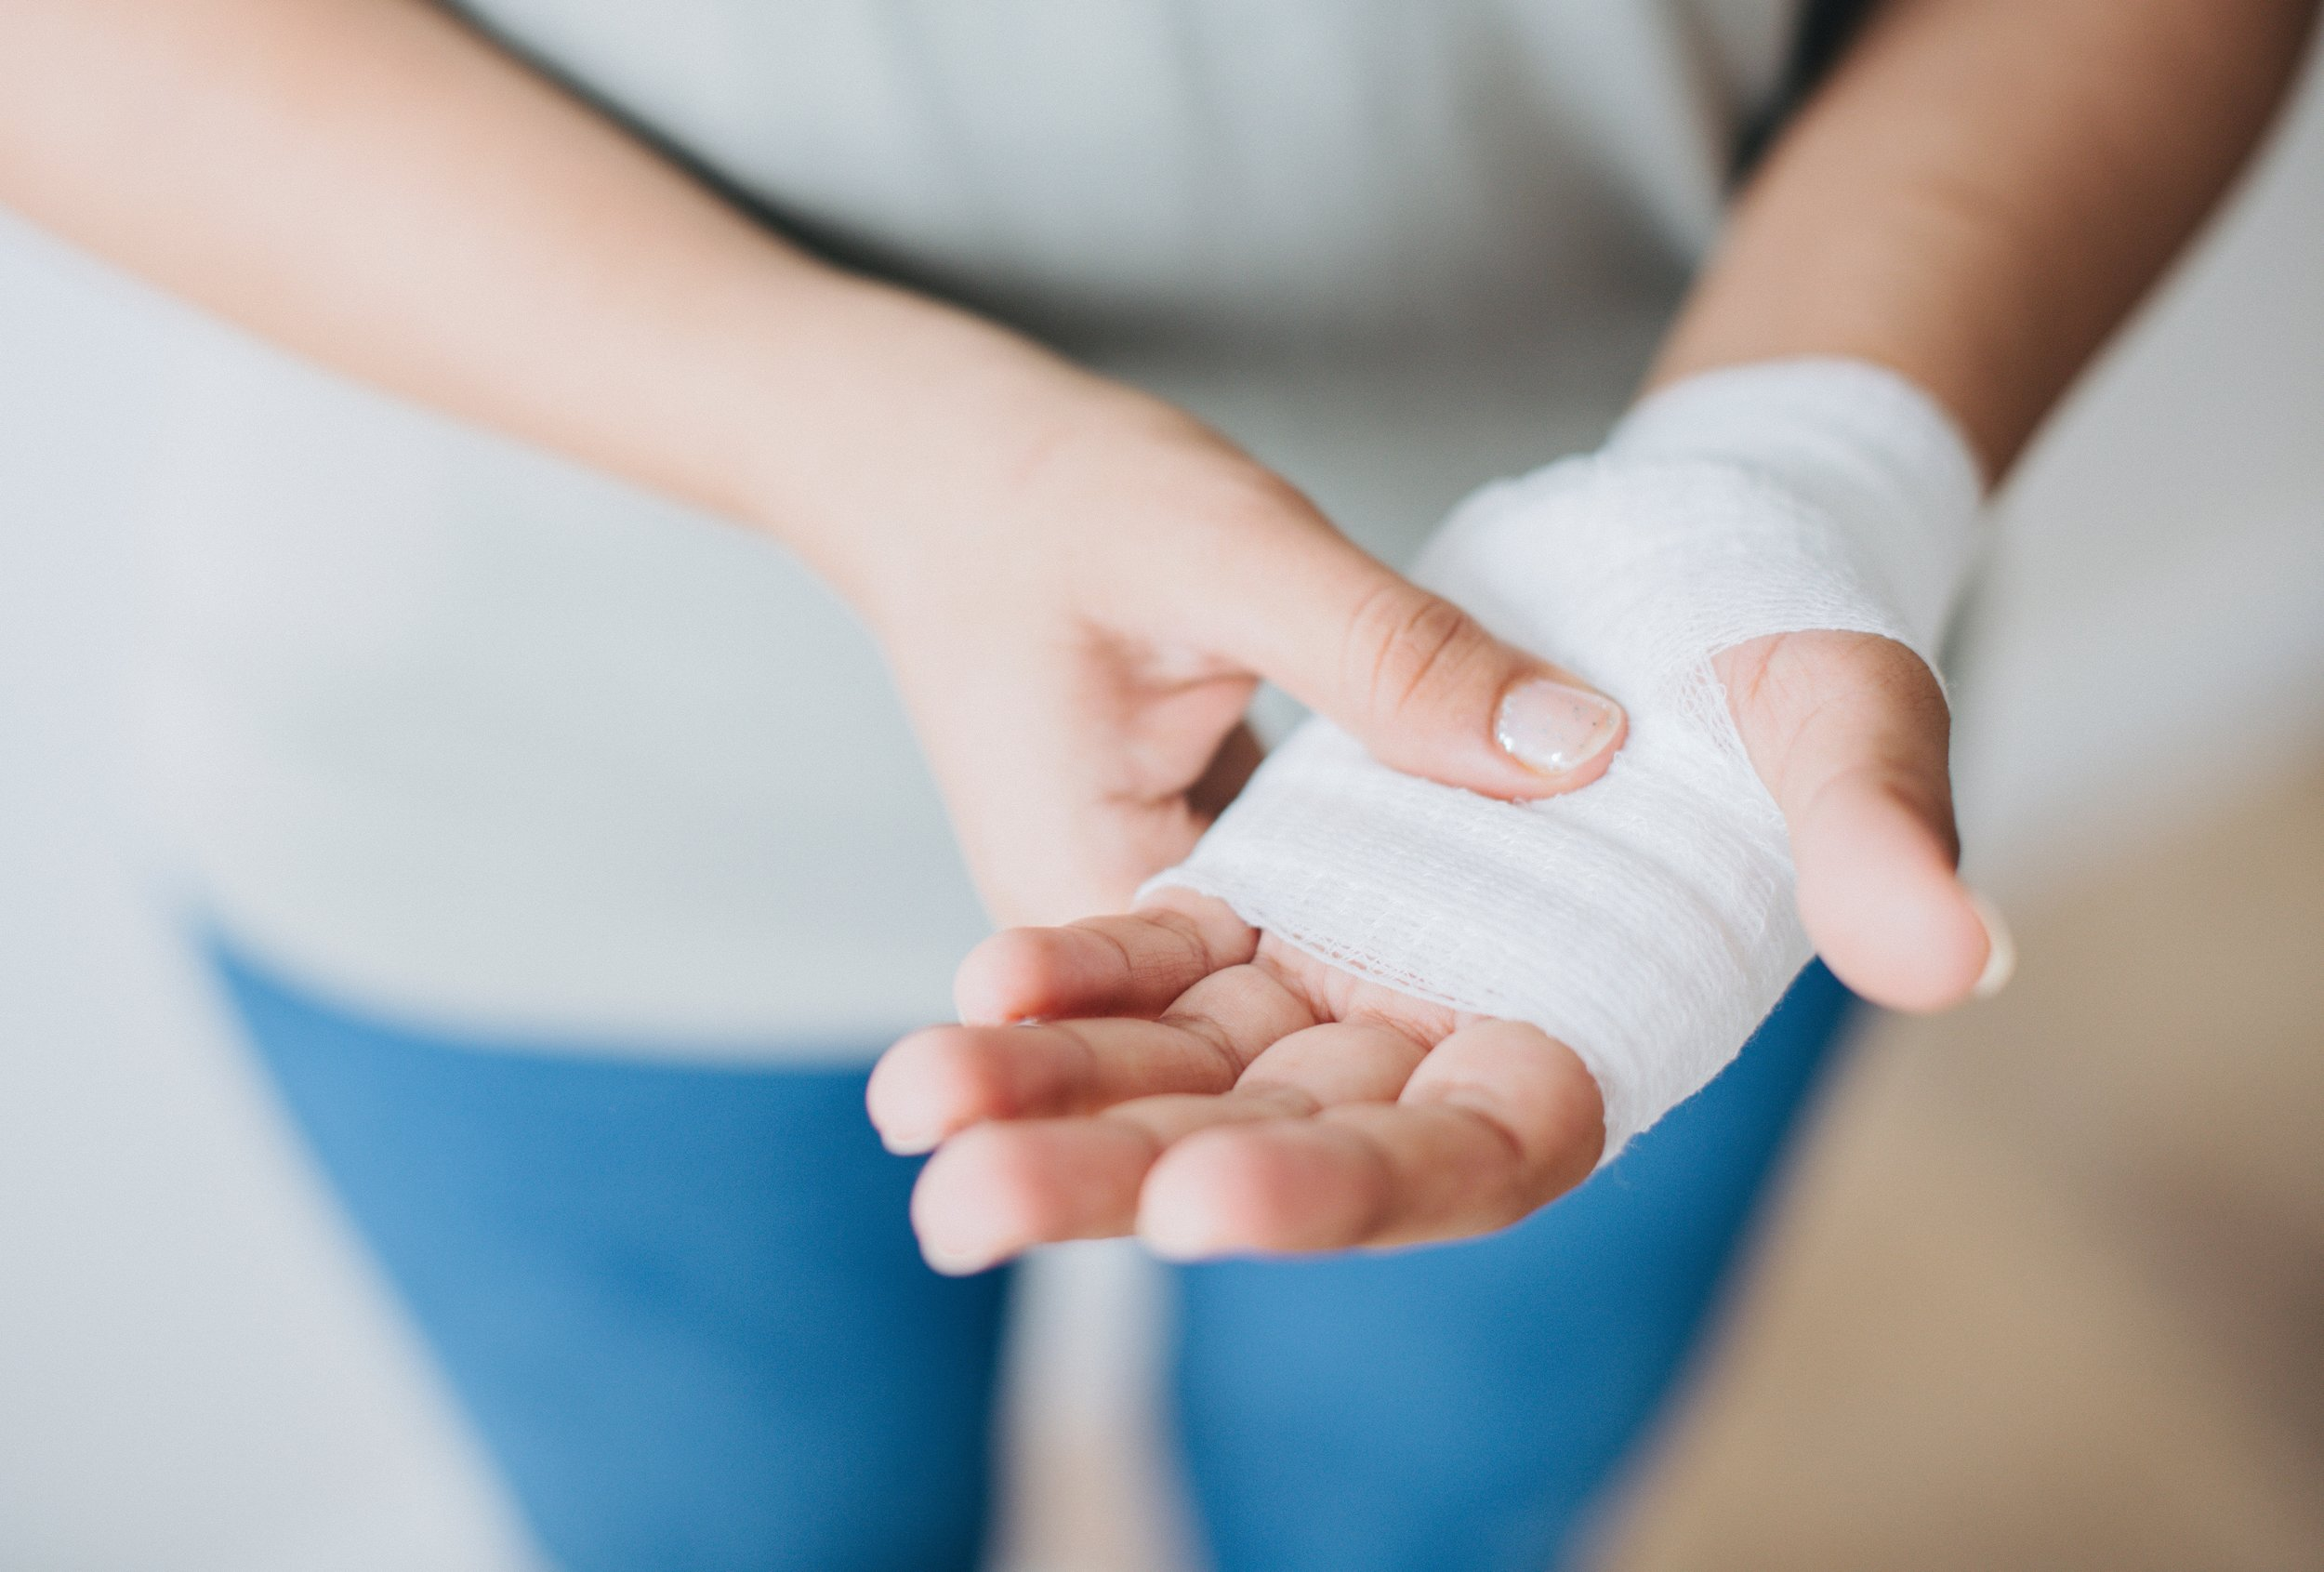 bandage hand rawpixel-1135756-unsplash.jpg